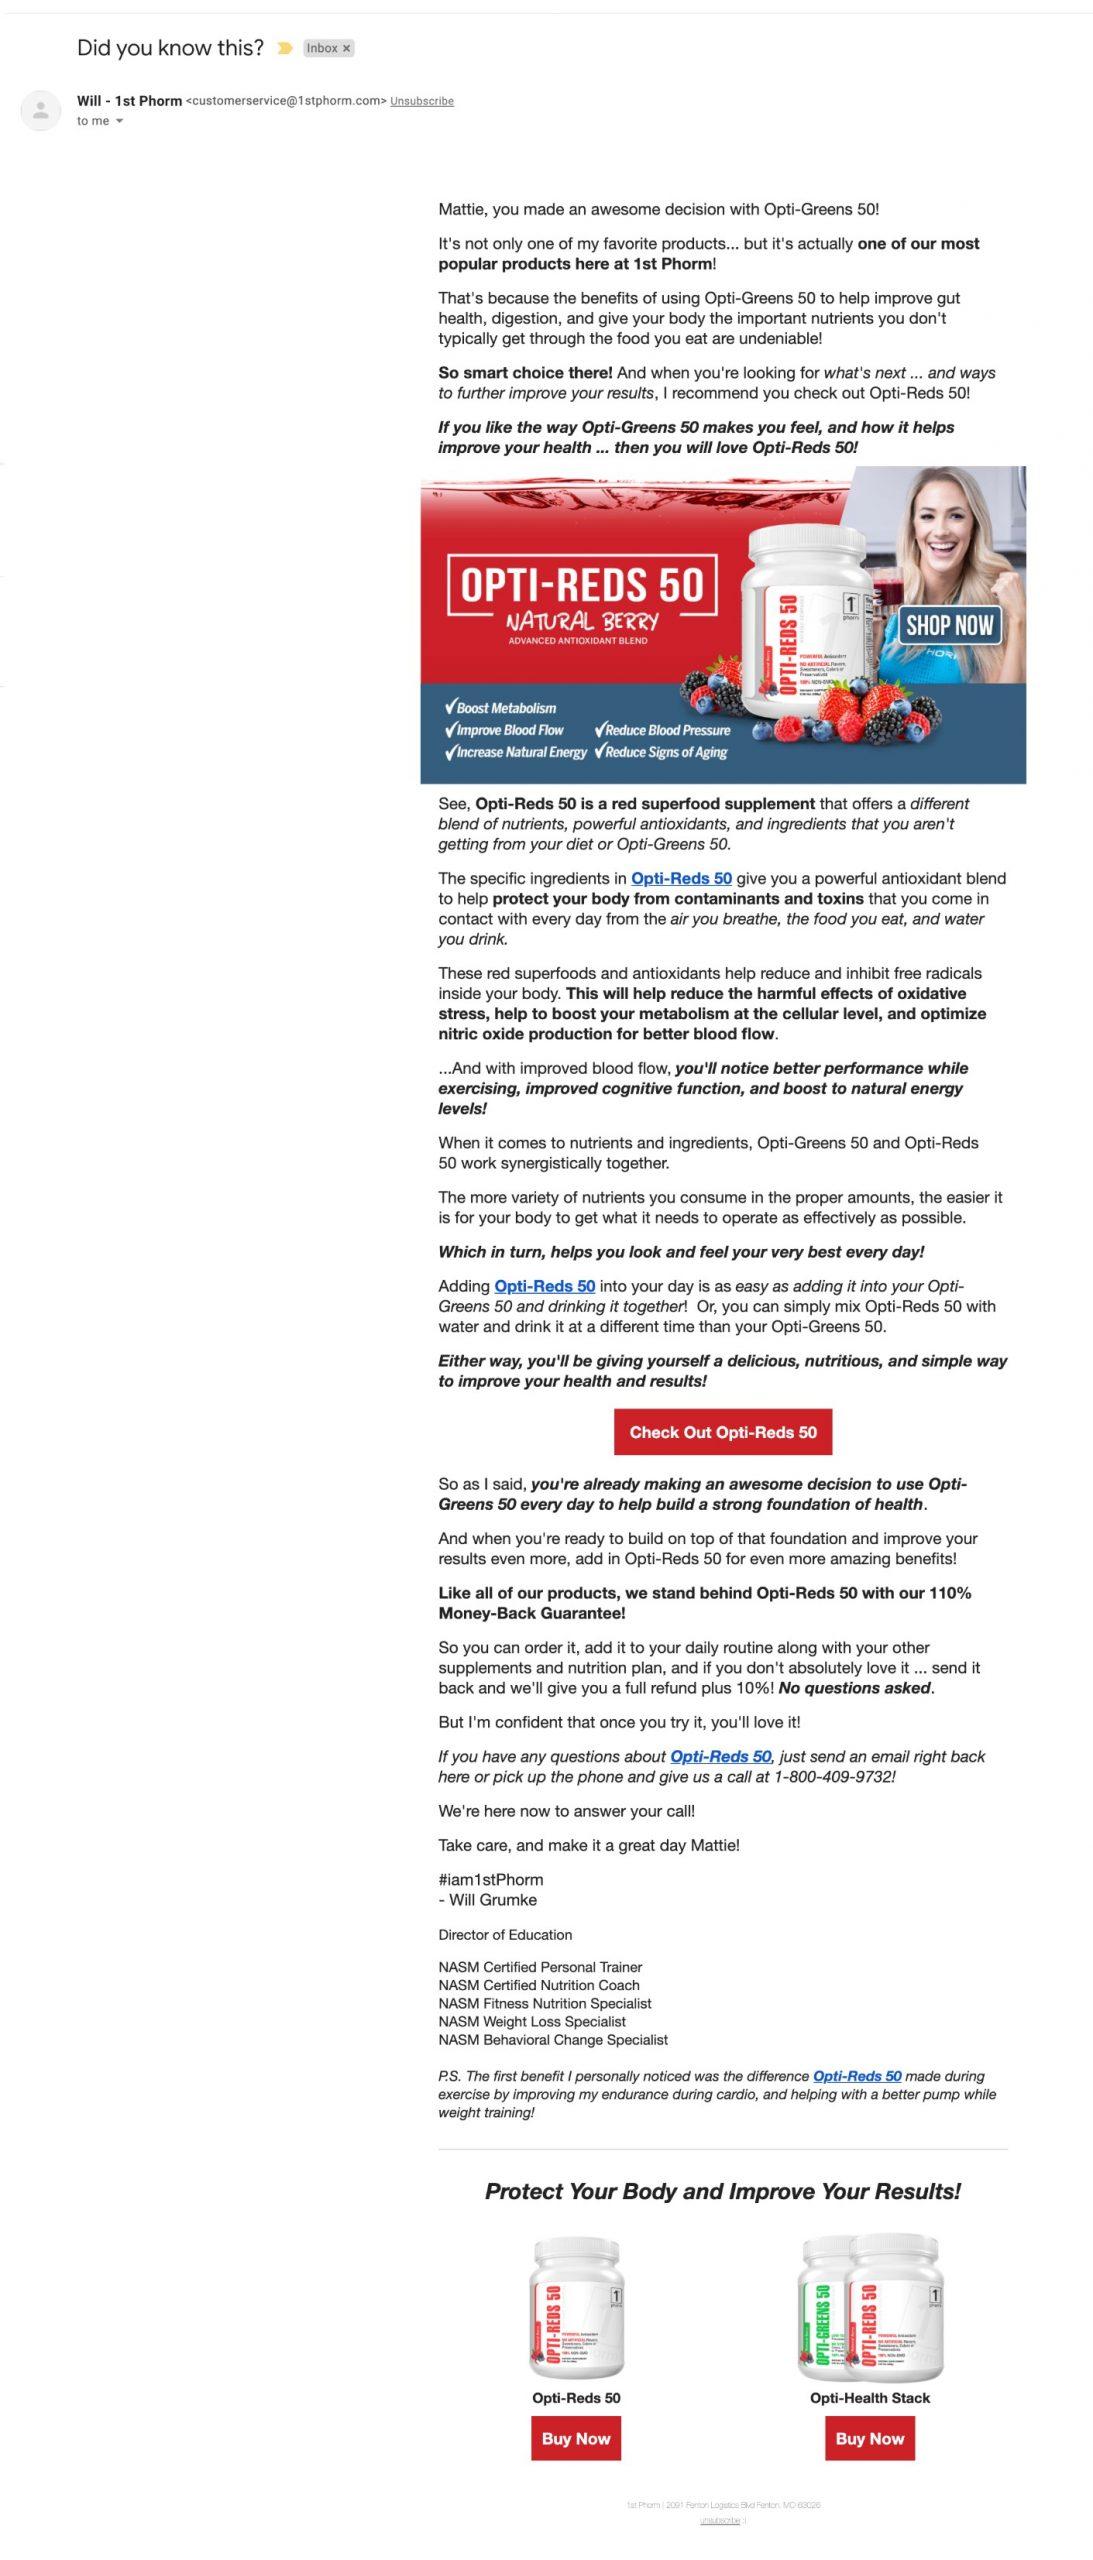 Email Breakdown: 1st Phorm